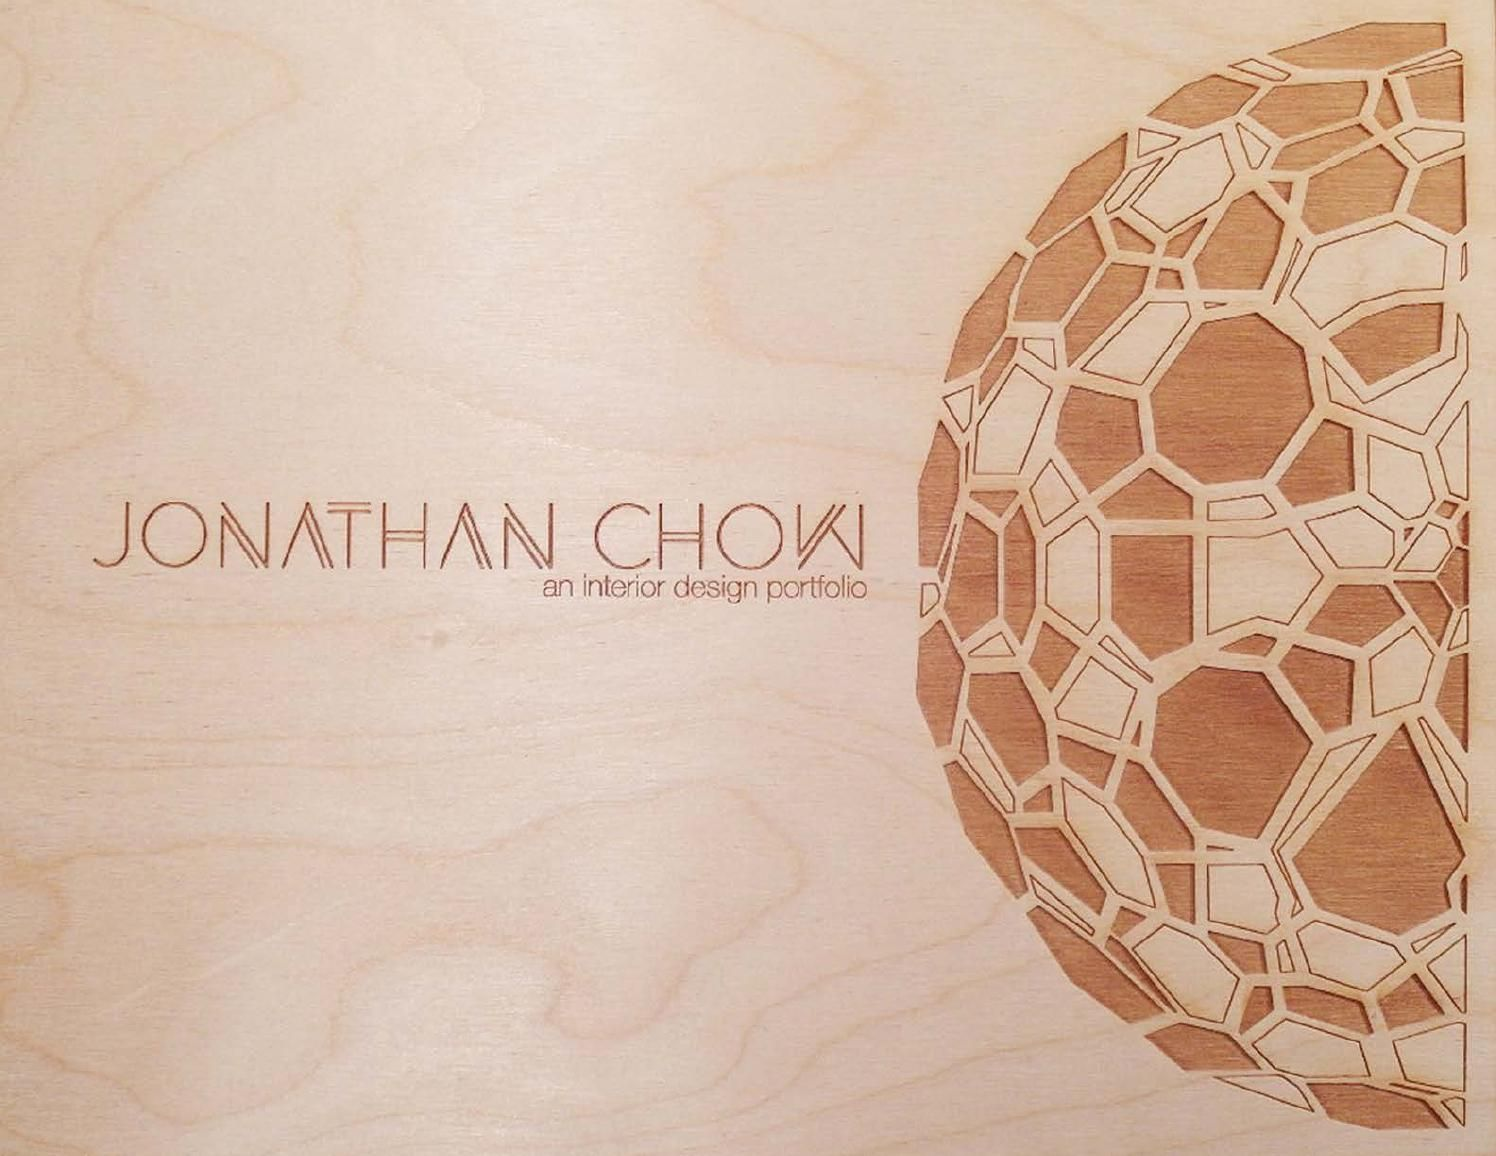 Jonathan Chow's Interior Design Portfolio 2014 by Jonathan Chow